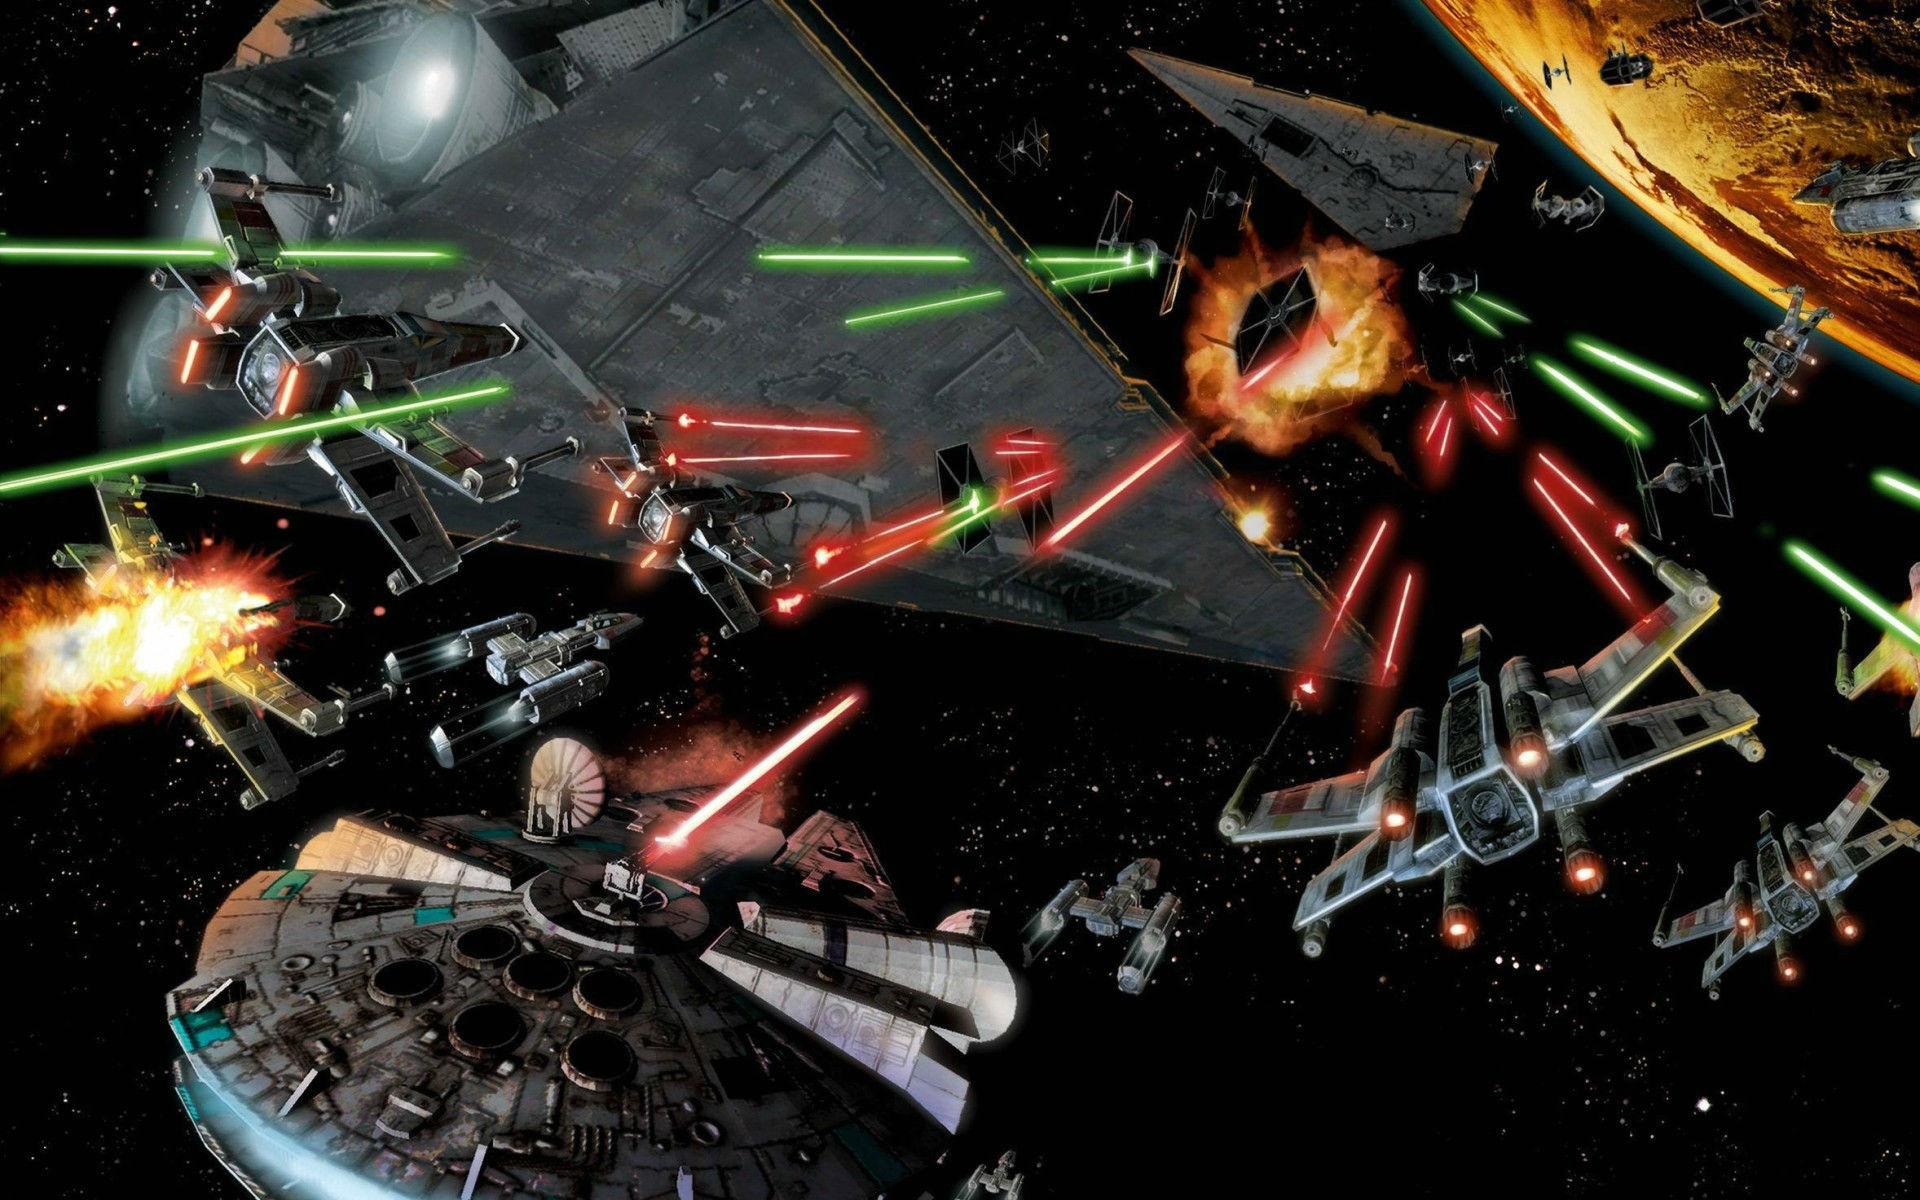 Space Battle Star Wars Millennium Falcon Art wallpaper